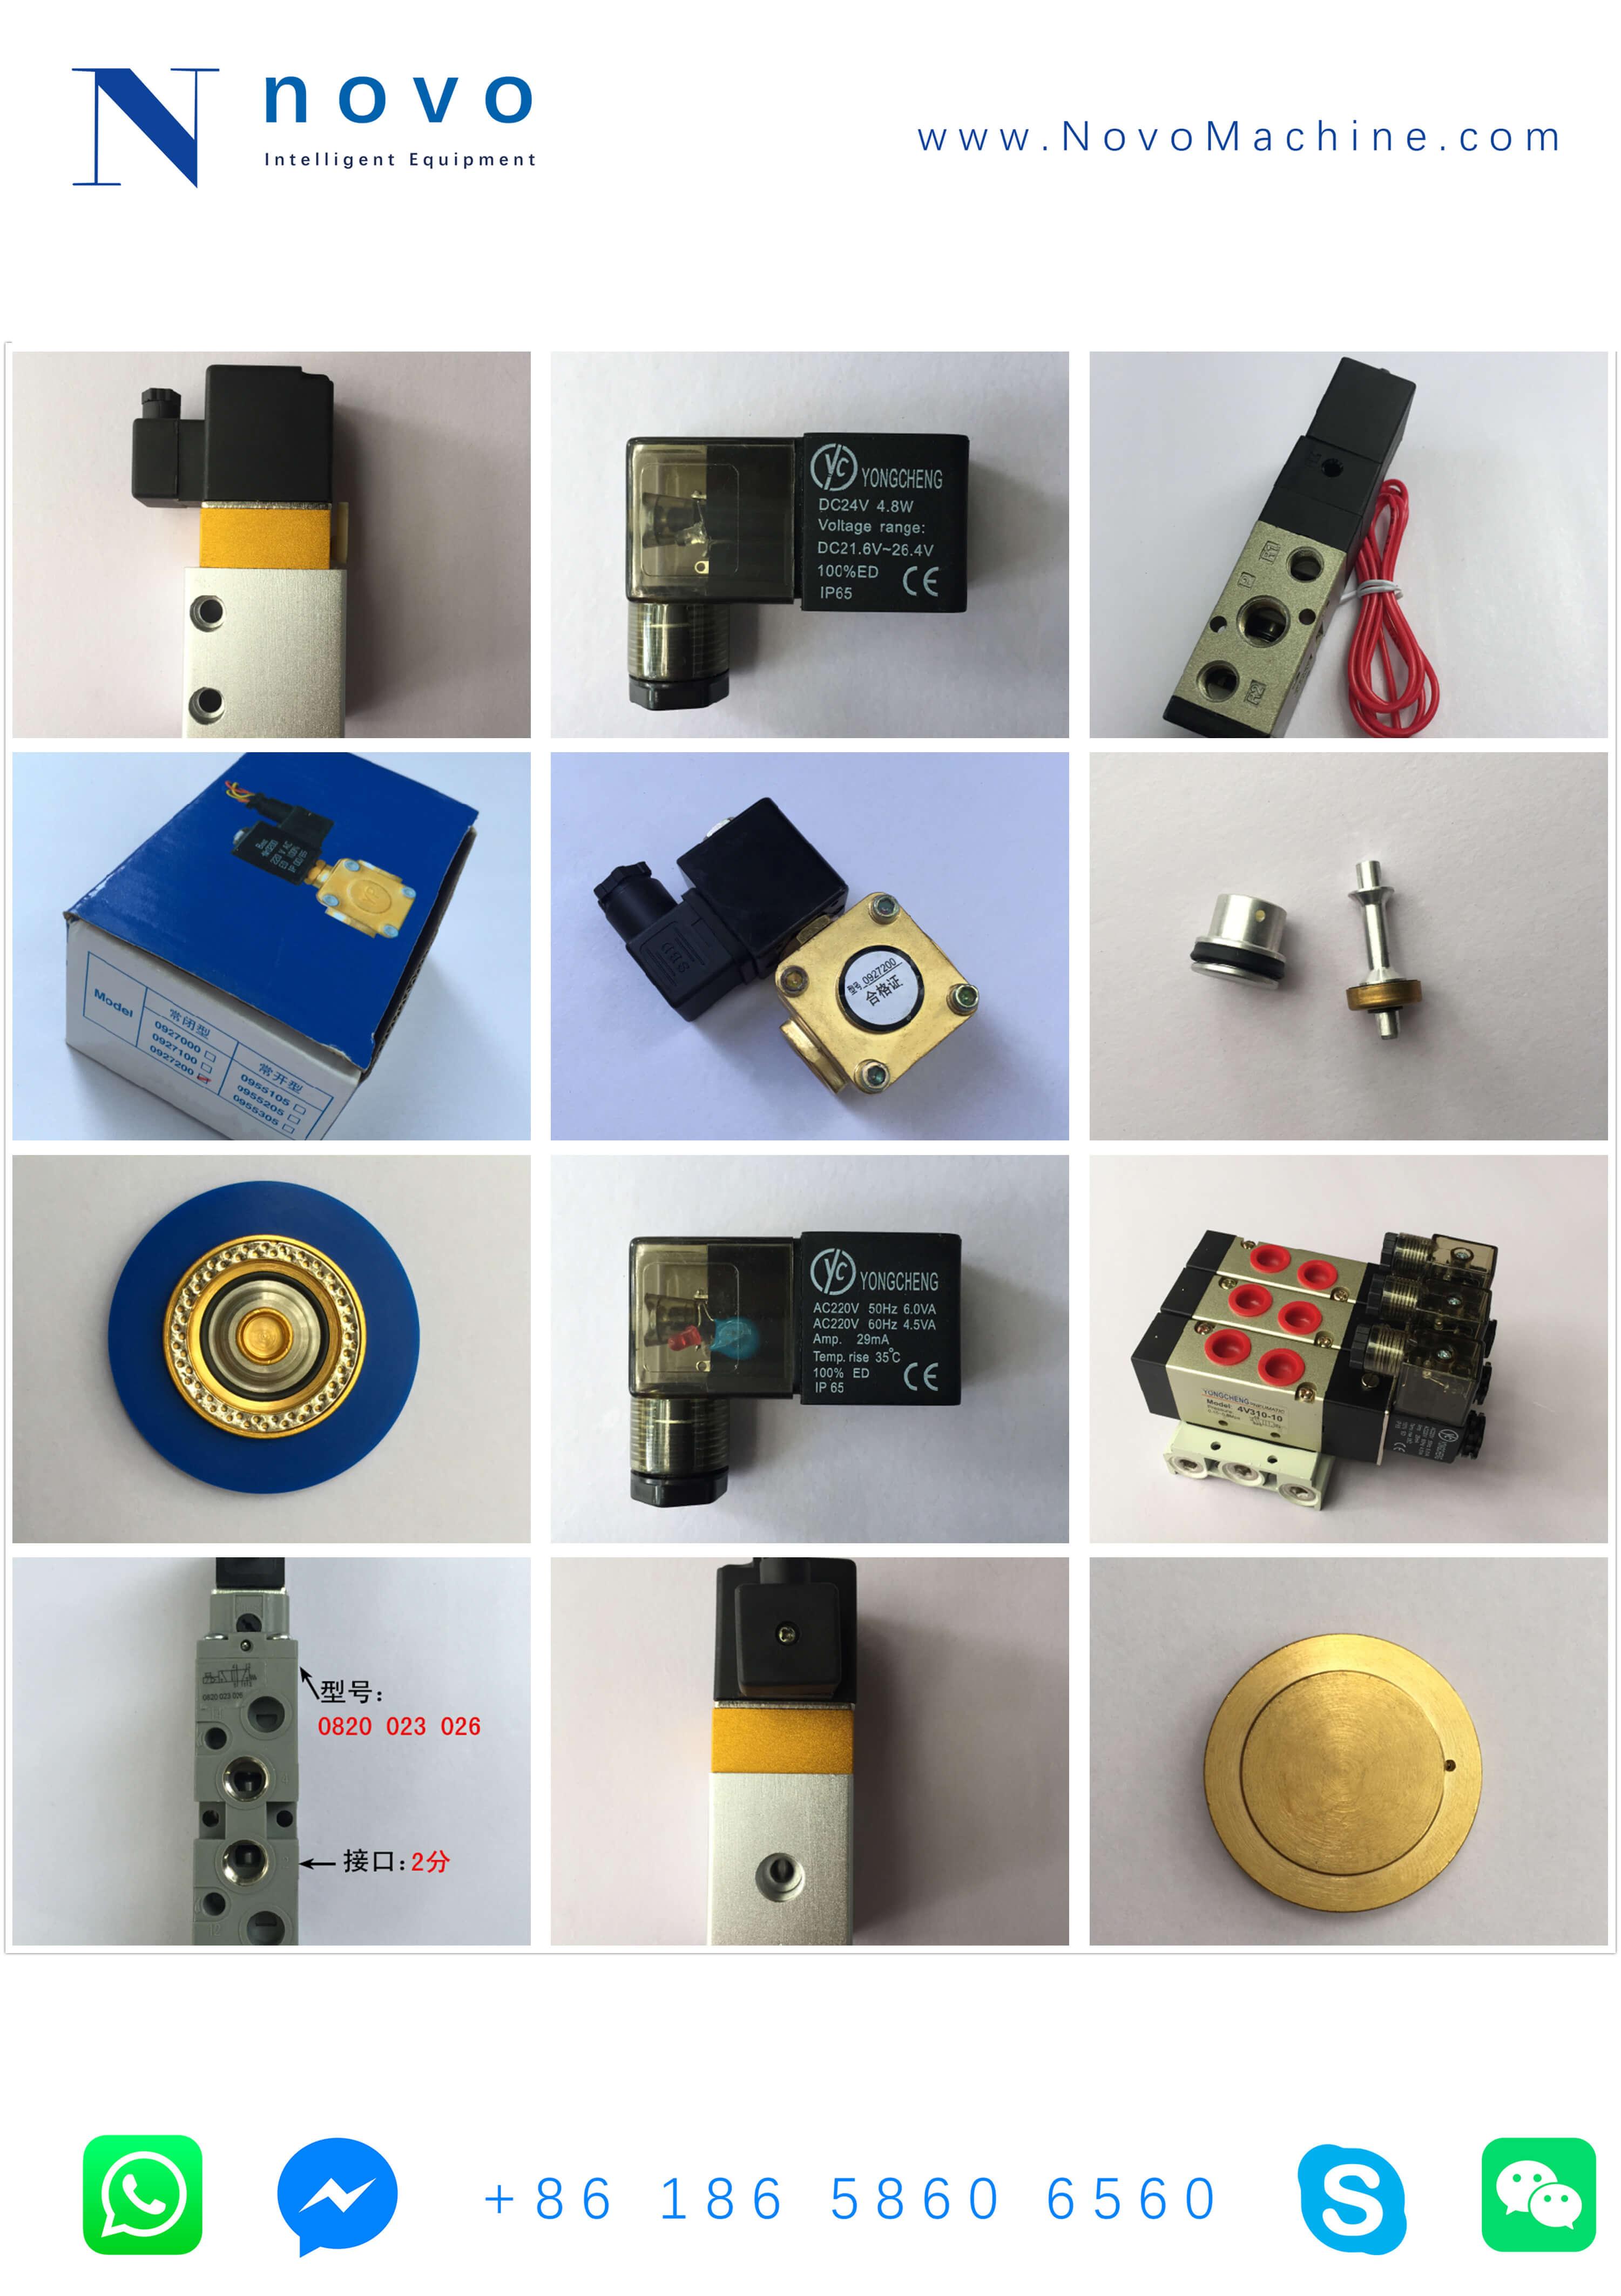 Solenoid-Valve-Spare-parts-for-Novo-PET-bottle-blowing-molder-machine